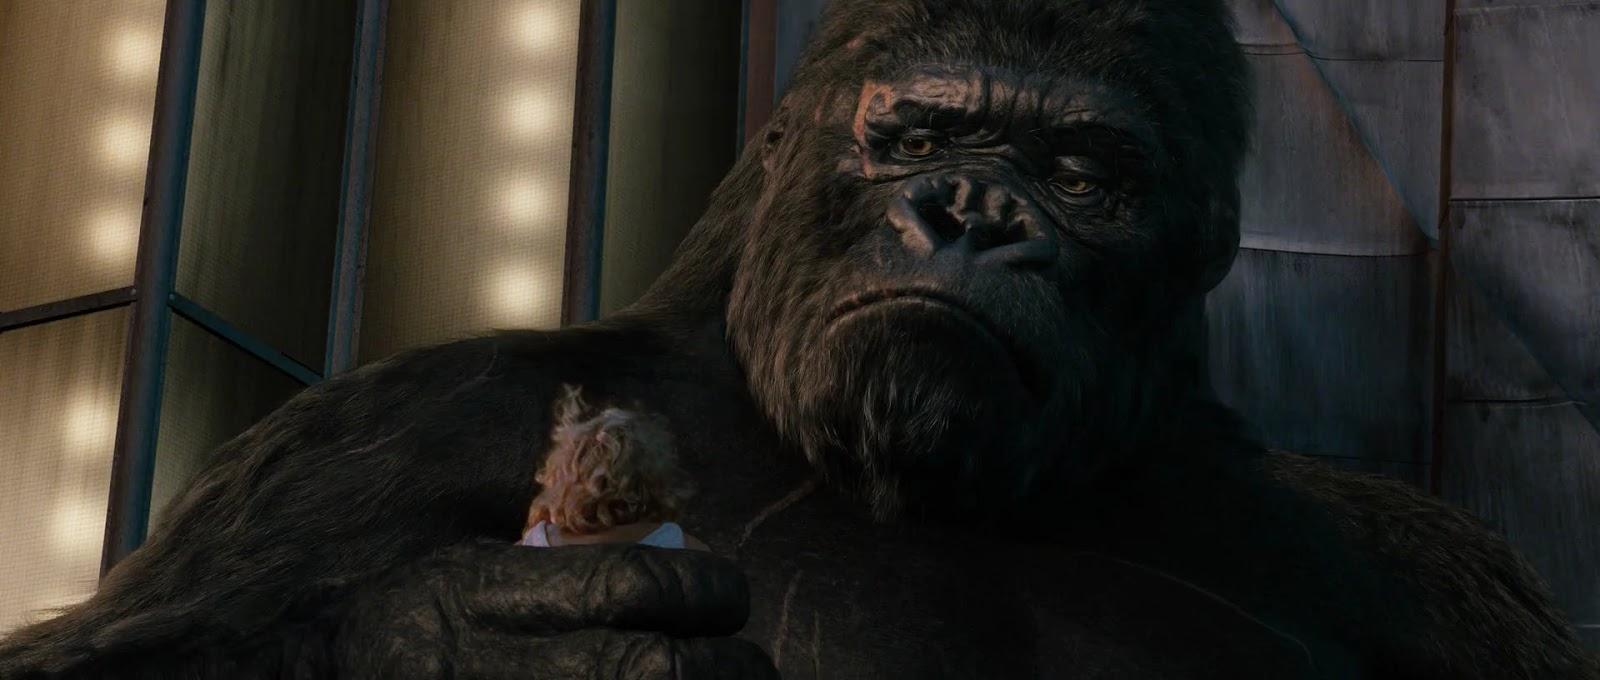 King Kong 3d Trailer Uglies By Scott Westerfeld Movie Trailer -> Pelismegahd